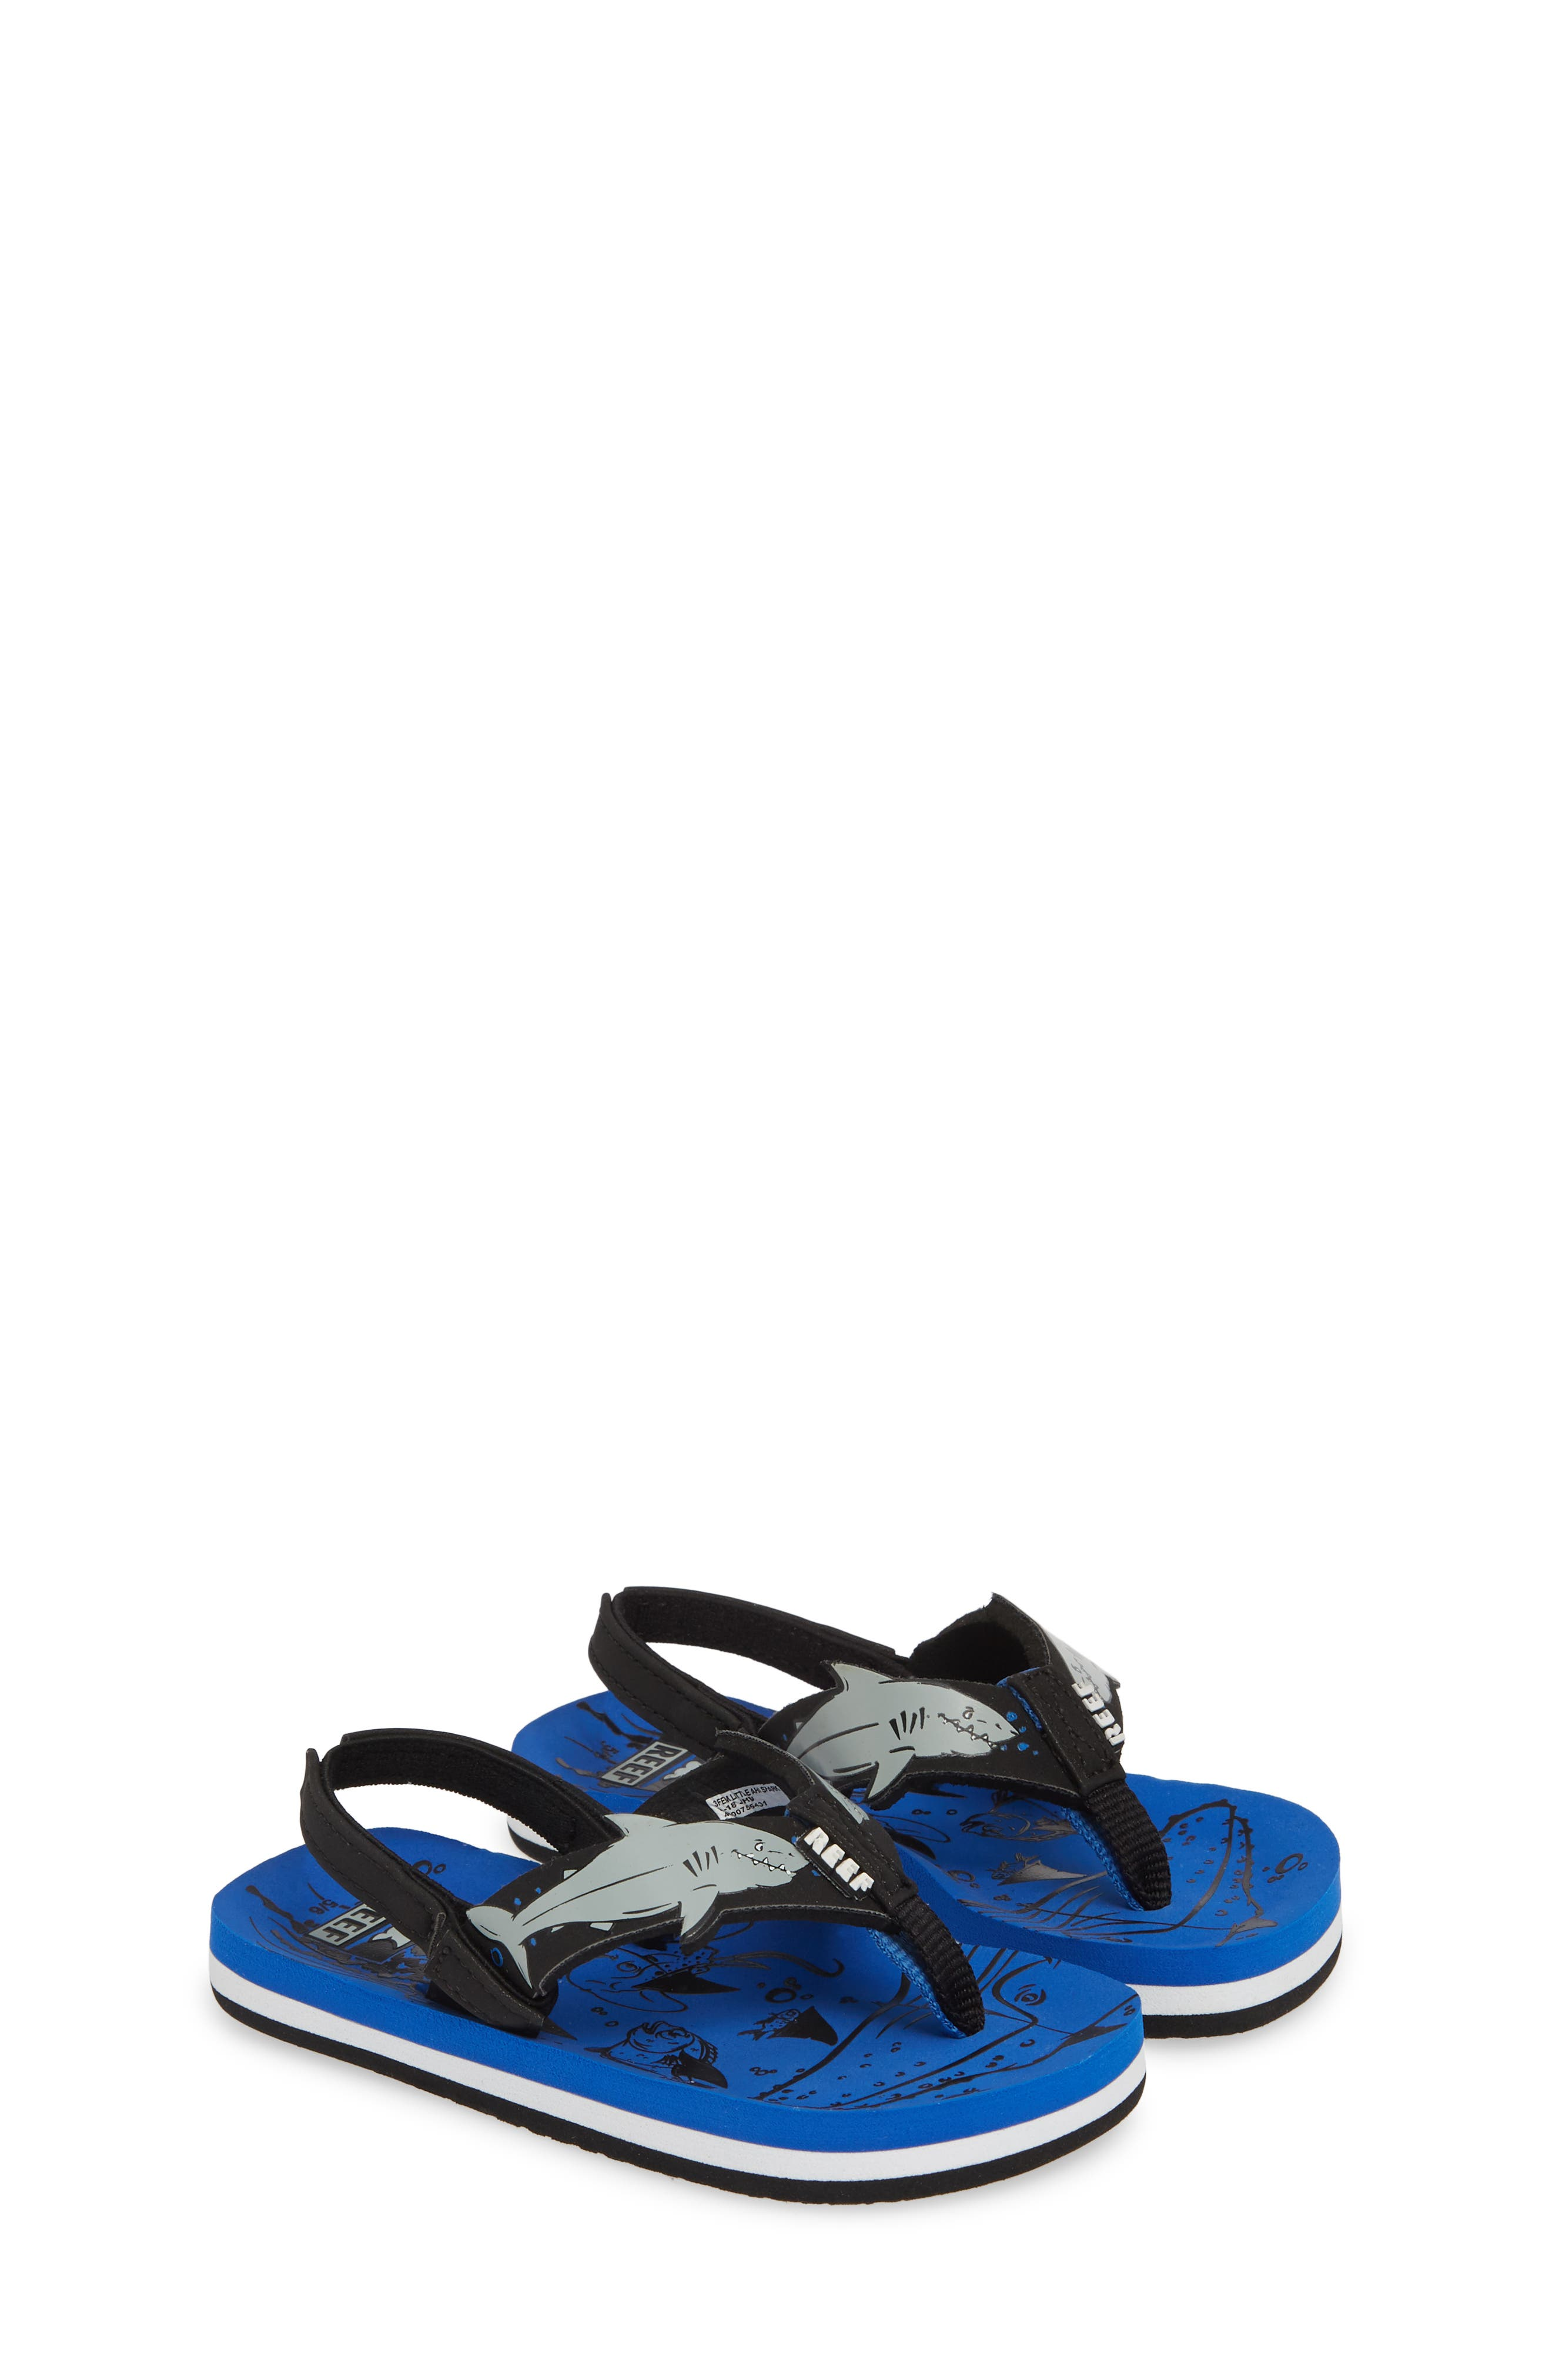 REEF, Ahi Shark Flip Flop, Alternate thumbnail 2, color, BLUE